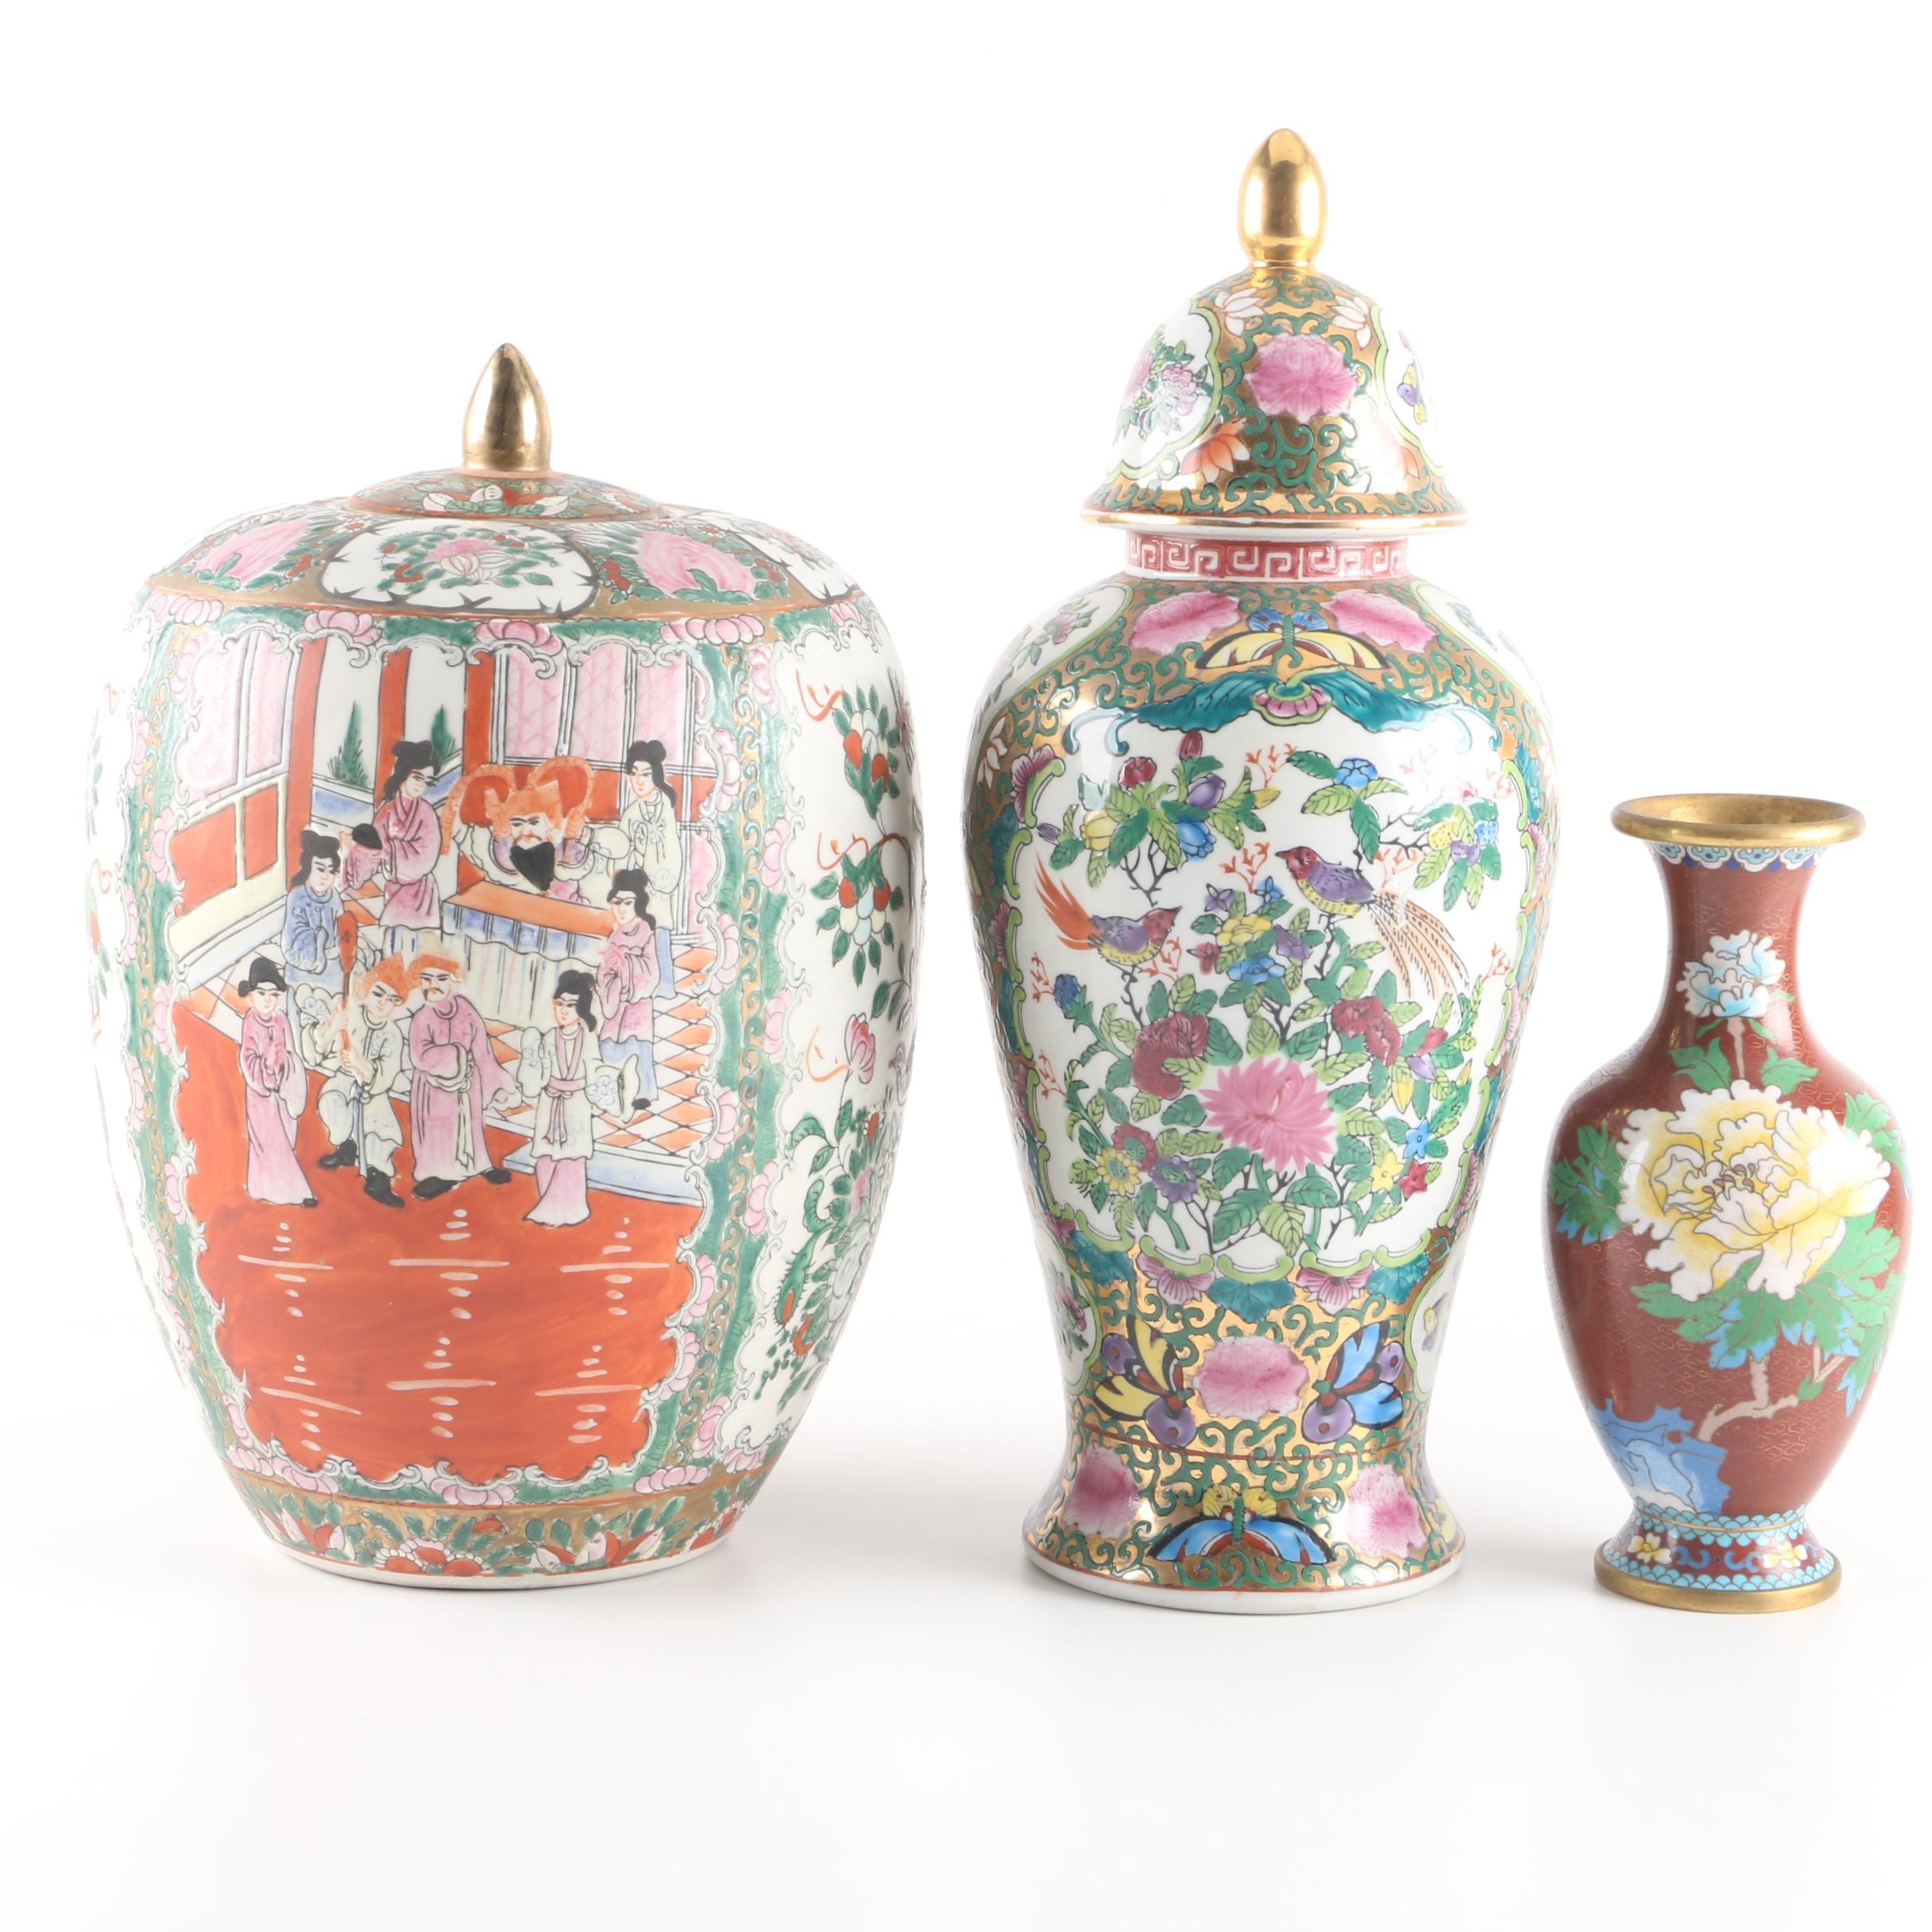 Chinese Cloisonne Vase with Ceramic Jars